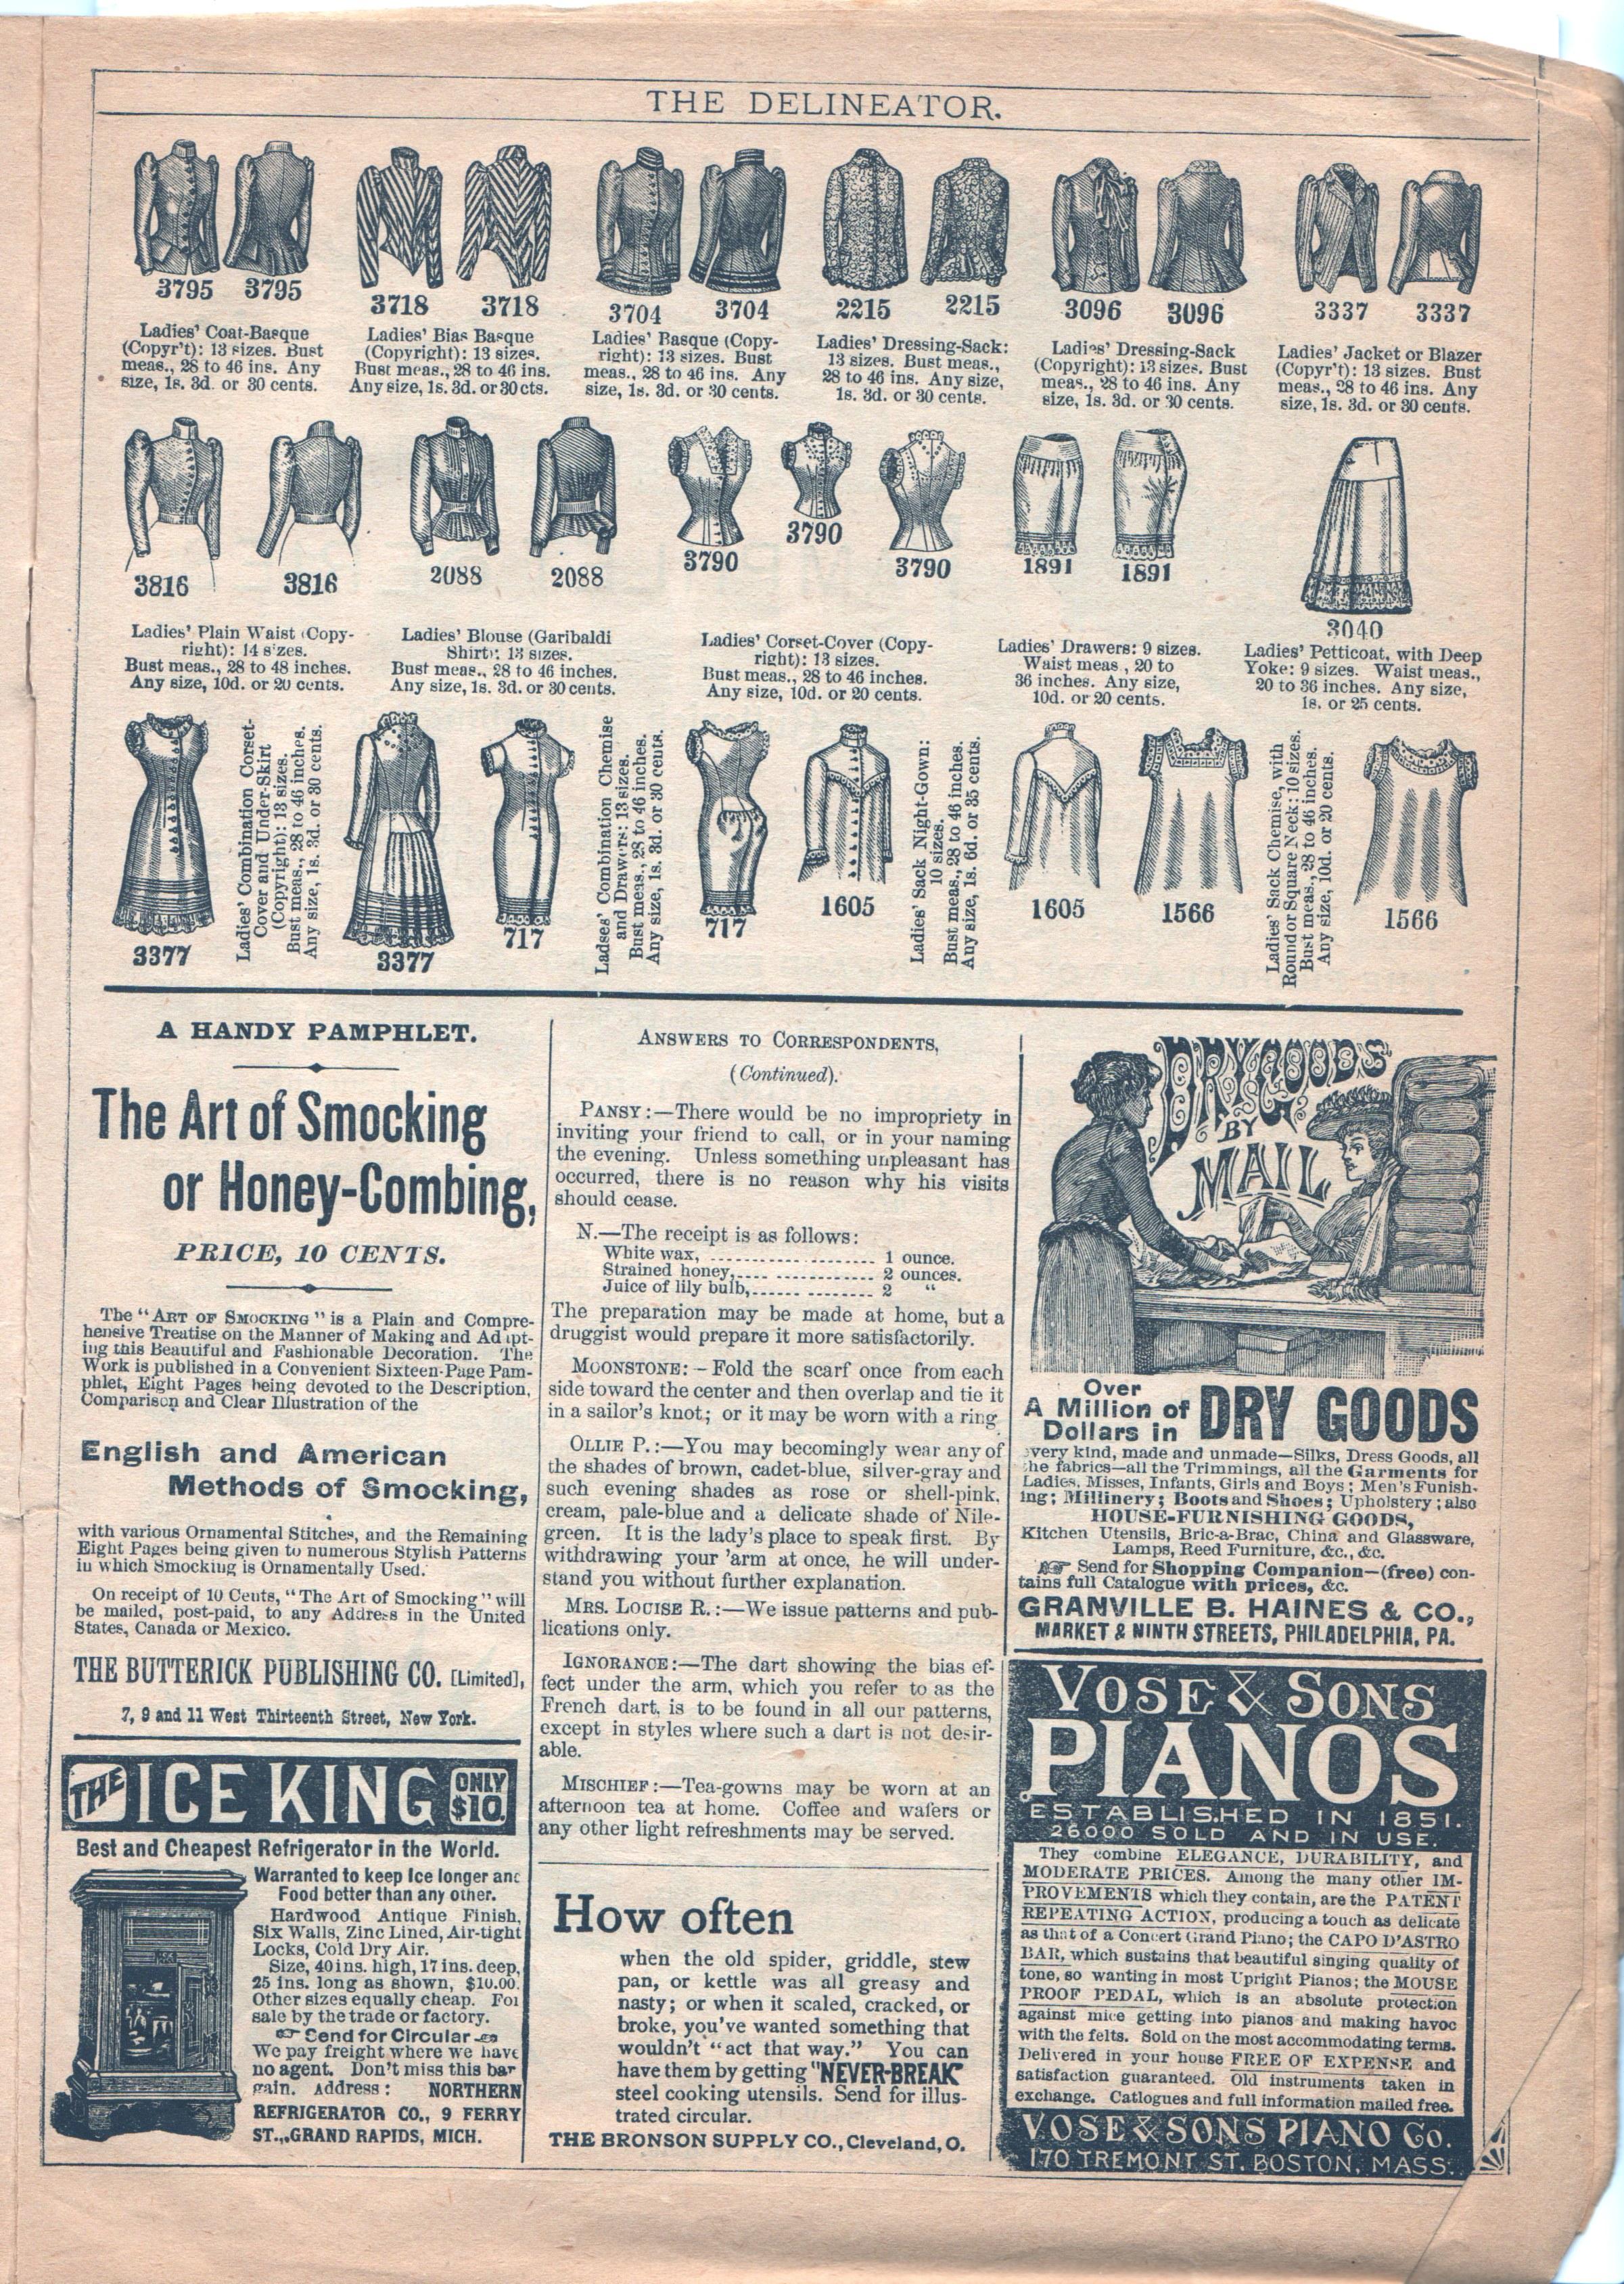 night dress, victorian night  dress, old fashion night dress, underwear, victorian underwear, old fashion underwear,  skirt, victorian skirt, old fashion skirt,   blouse, victorian blouse, old fashion blouse,   dress, victorian dress, old fashion dress,   clothes, victorian clothes, old fashion clothes, jaket